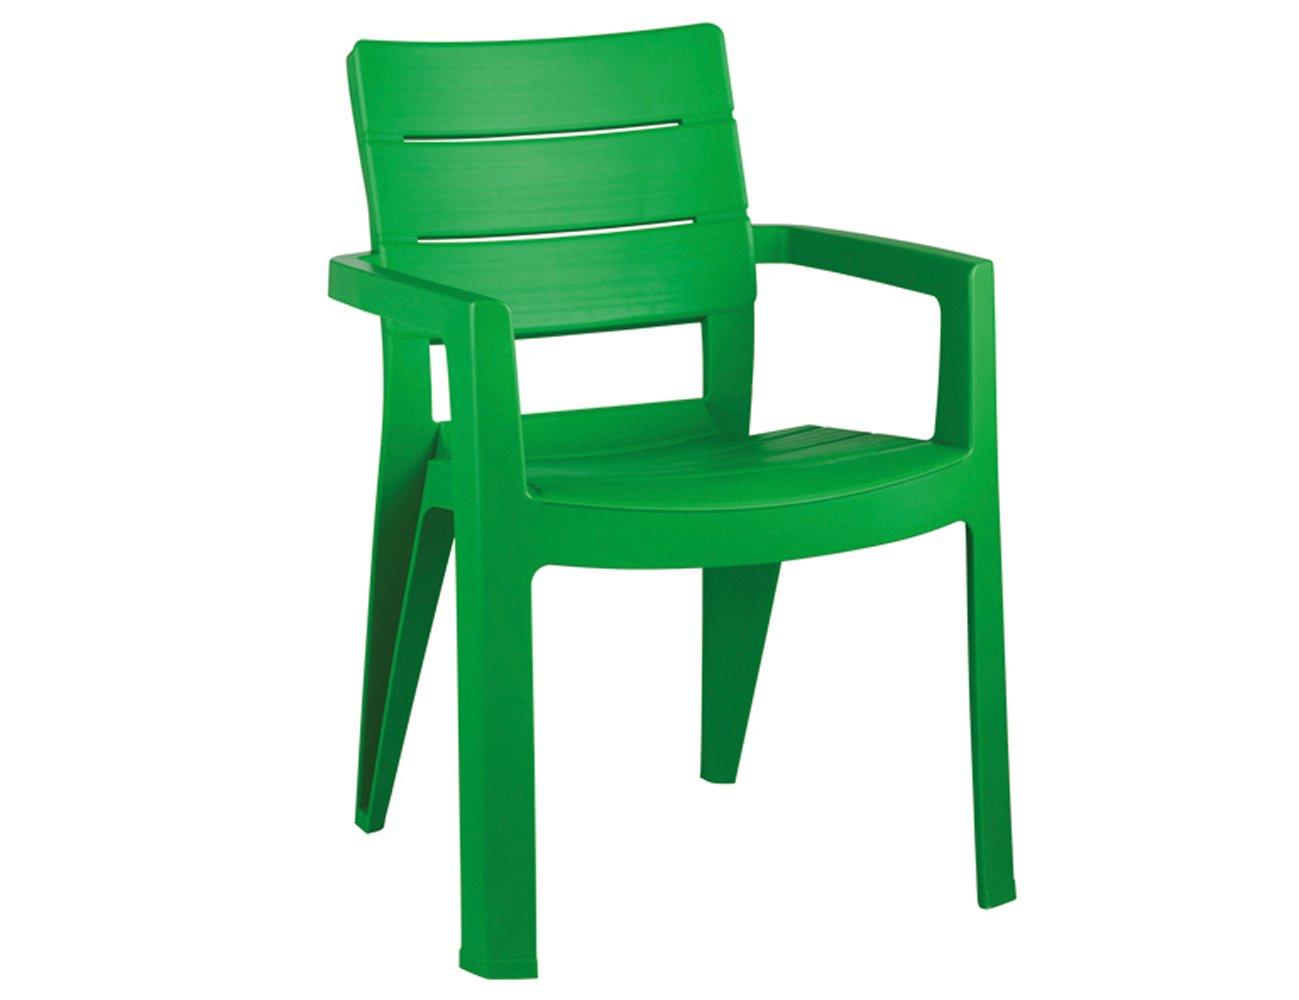 JARDIN 206972 Stapelsessel Ibiza, 62 x 62 x 83 cm, Vollkunststoff hellgrün